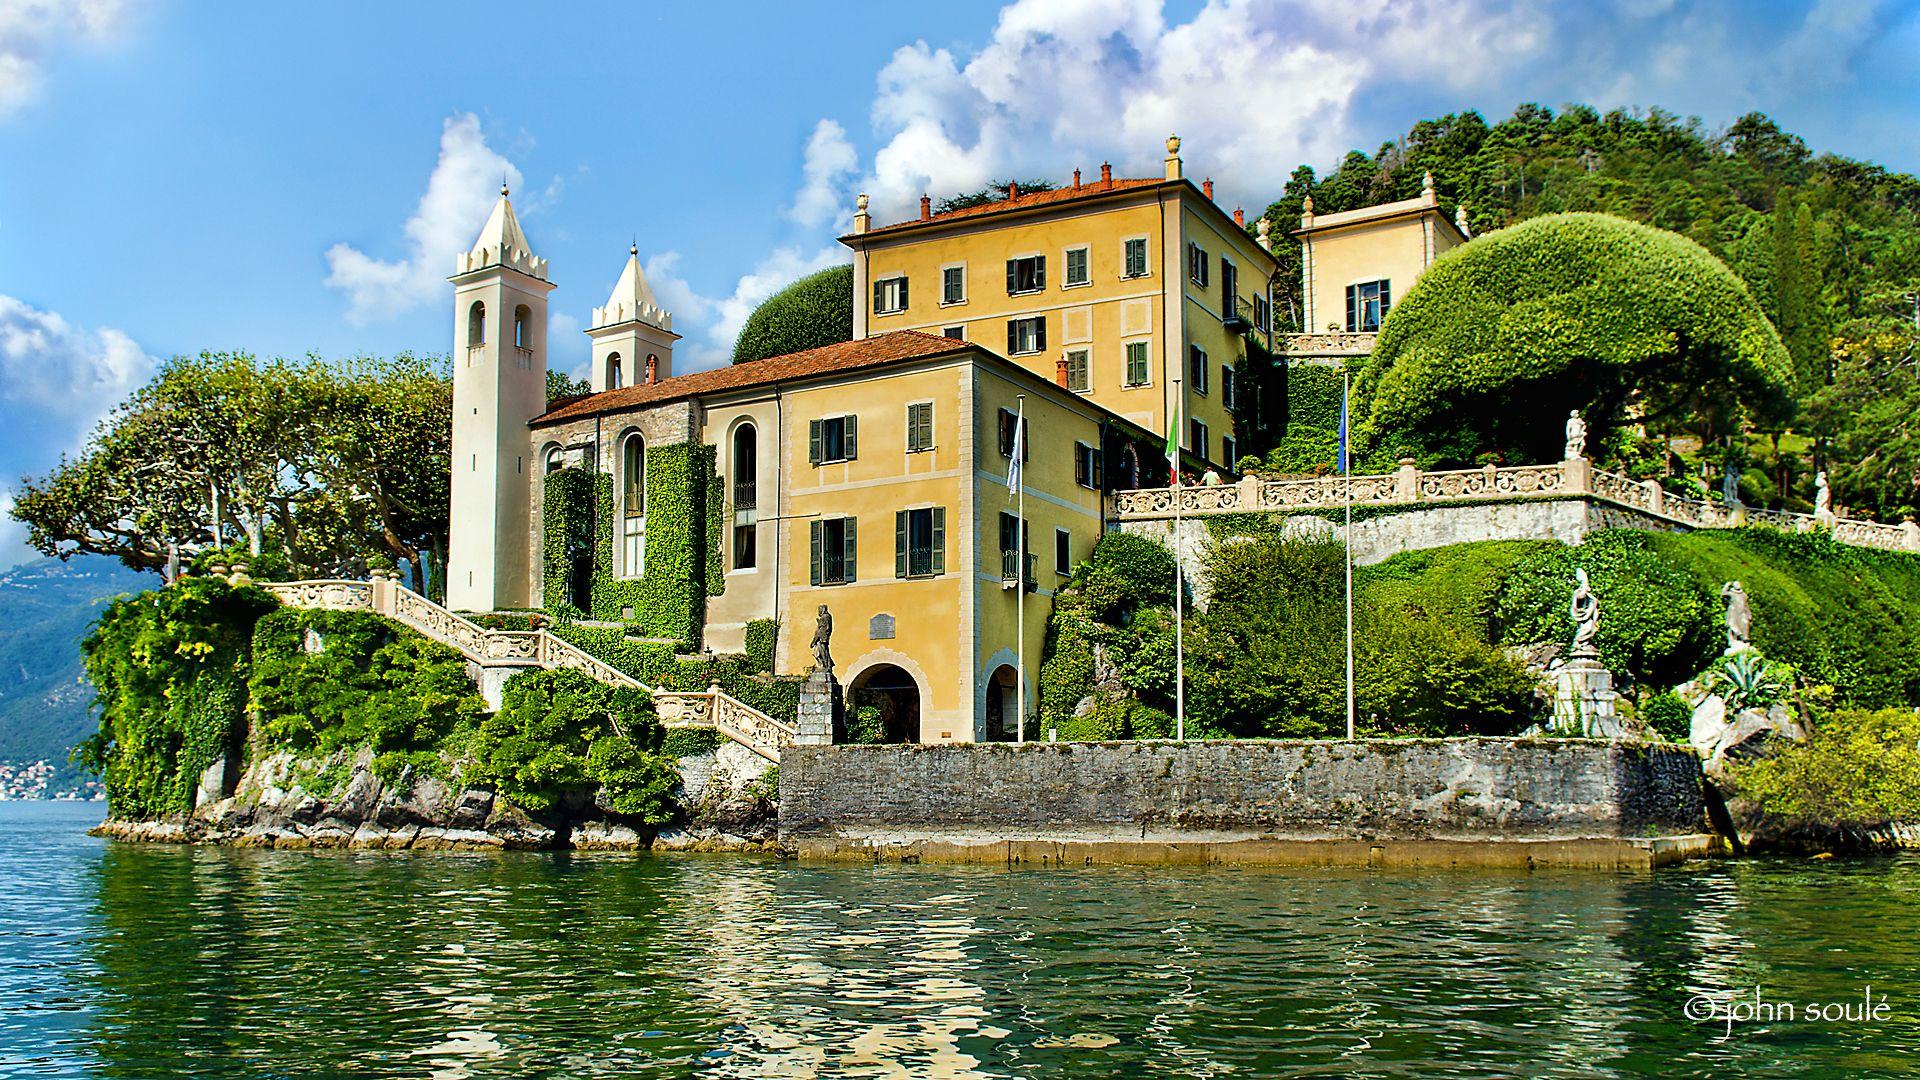 Villa Balbianello has been the location for numerous